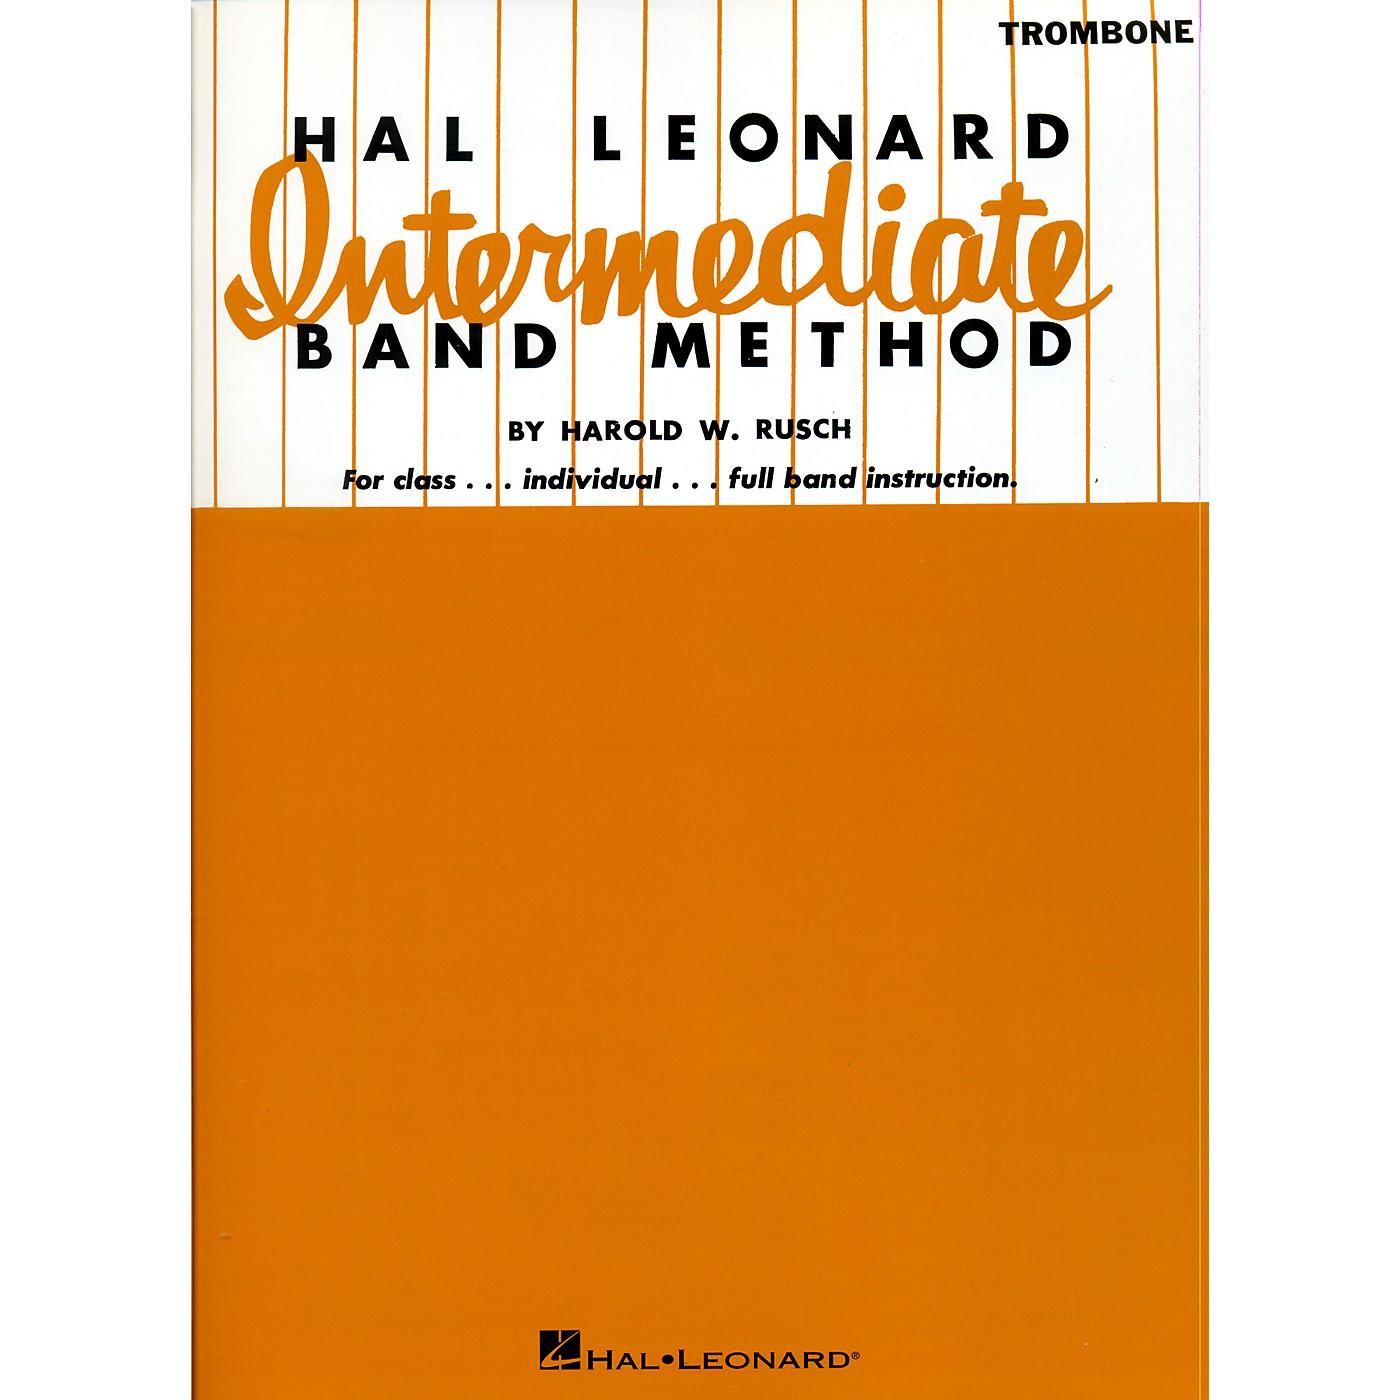 Hal Leonard Intermediate Band Method Trombone thumbnail